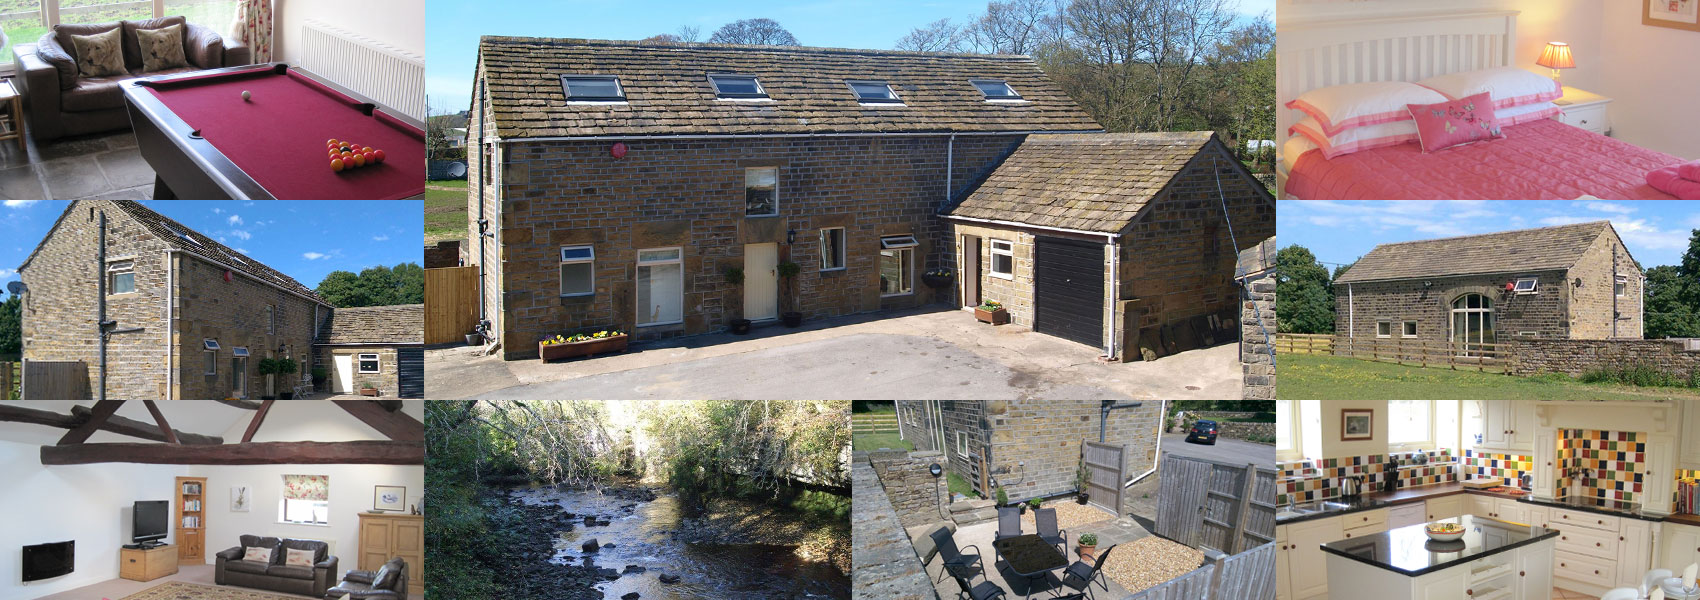 Bullace Barn, Millhouse Green, Penistone - exterior